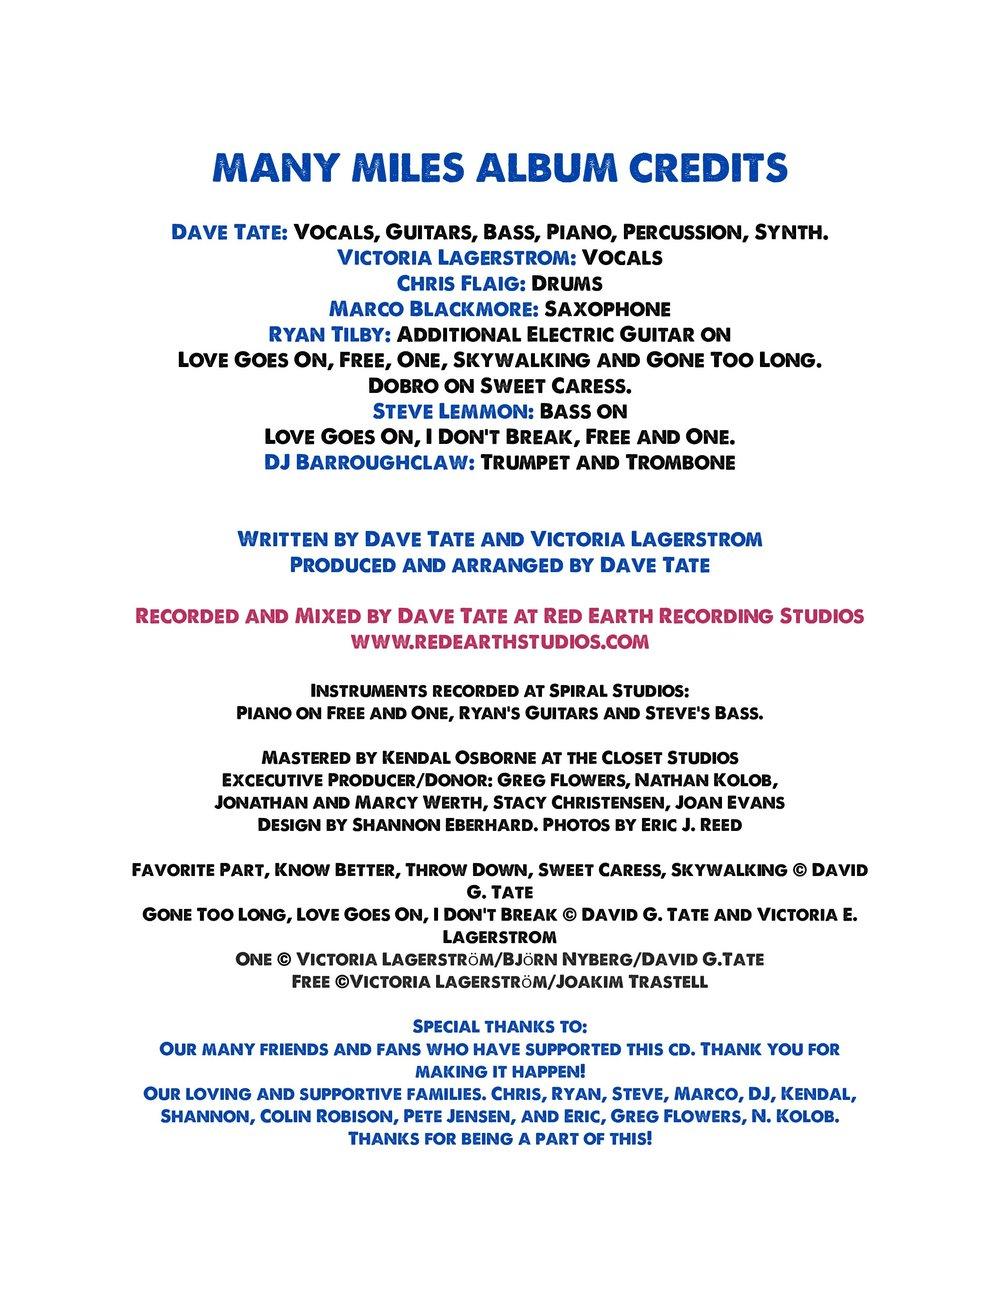 MANY MILES - Album Credits-page-001.jpg